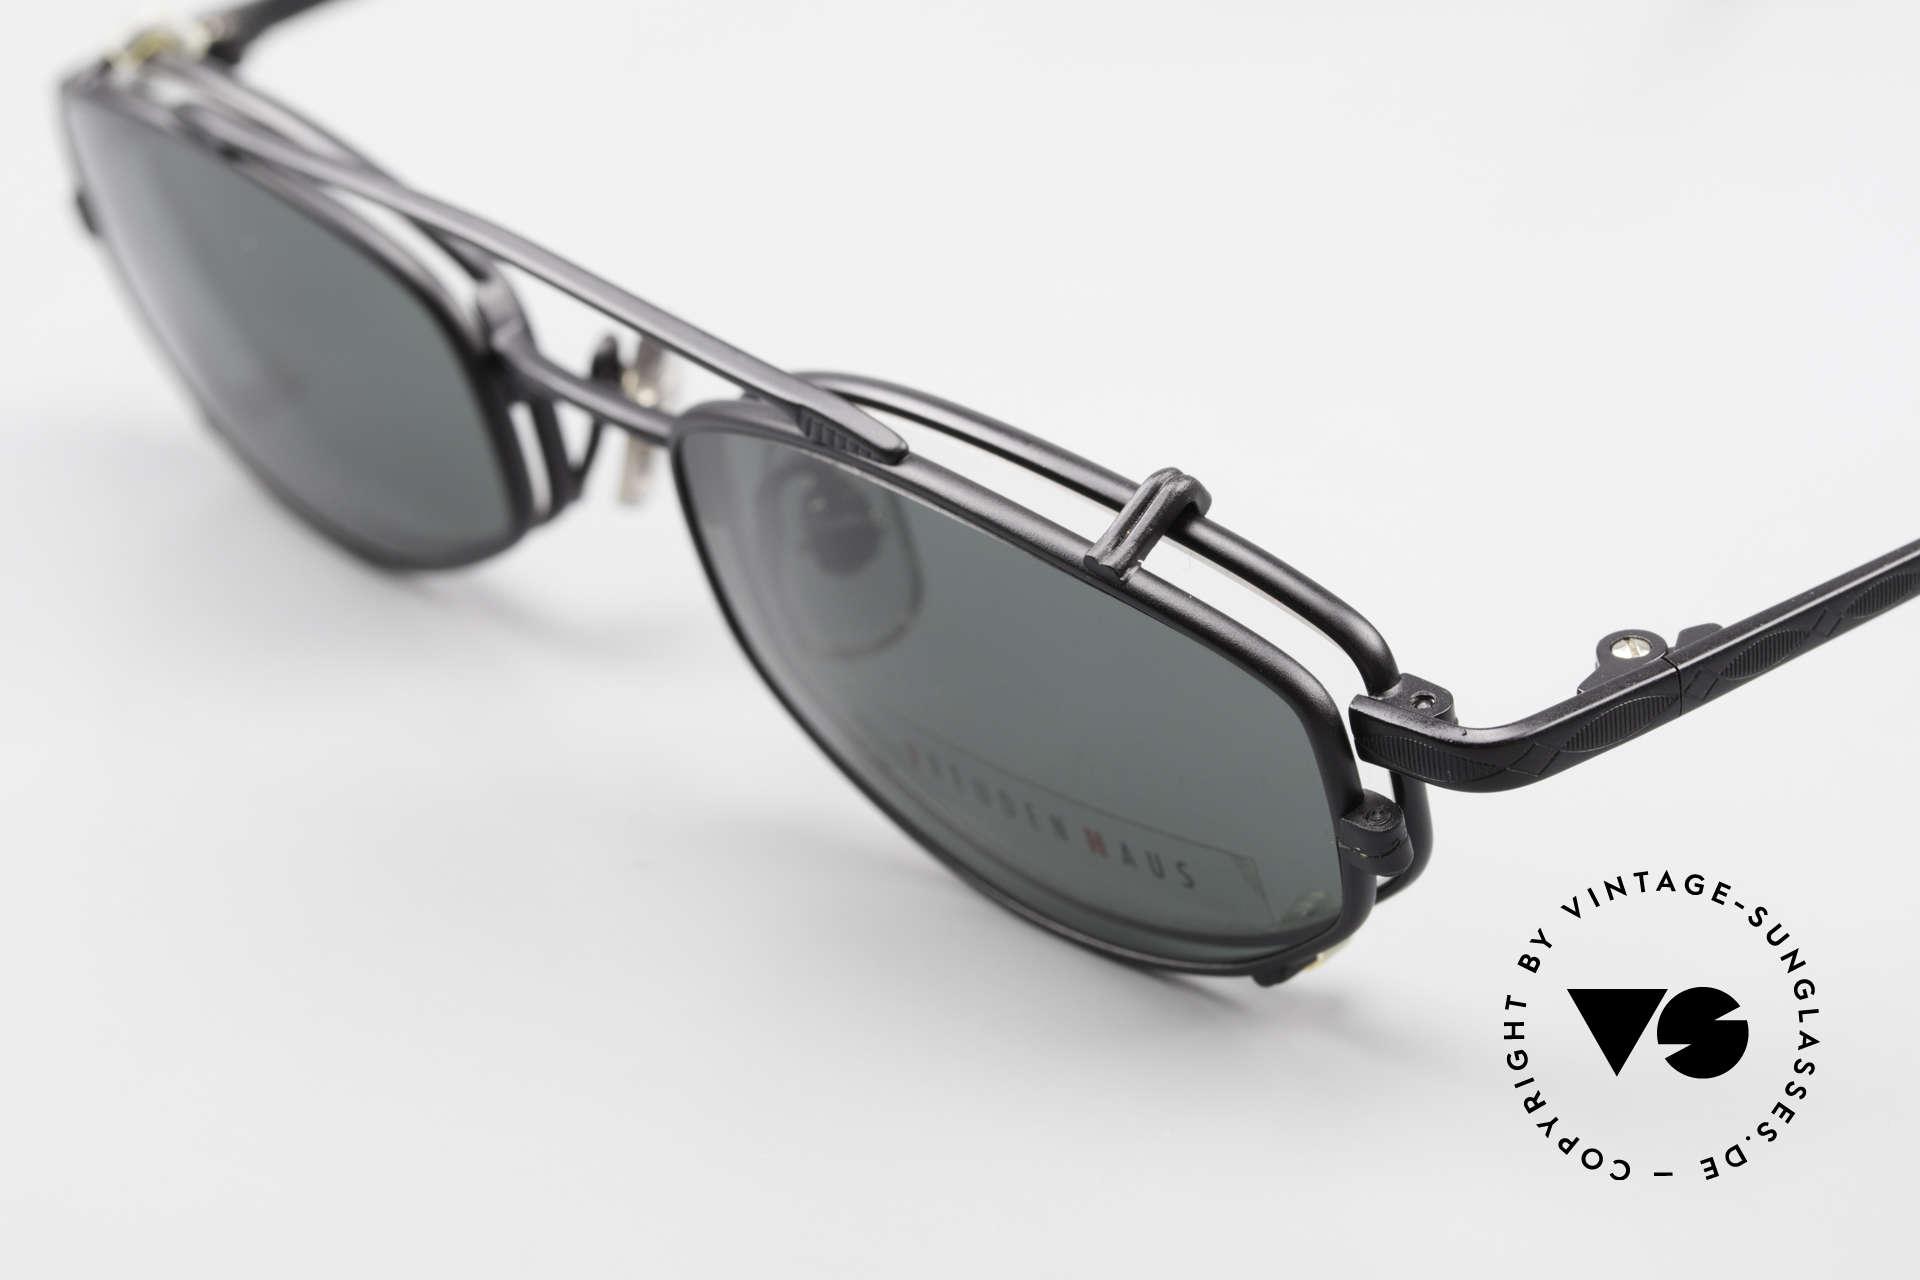 Freudenhaus Ita Titanium Frame With Sun Clip, timeless and sophisticated design; 100% Titanium, Made for Men and Women